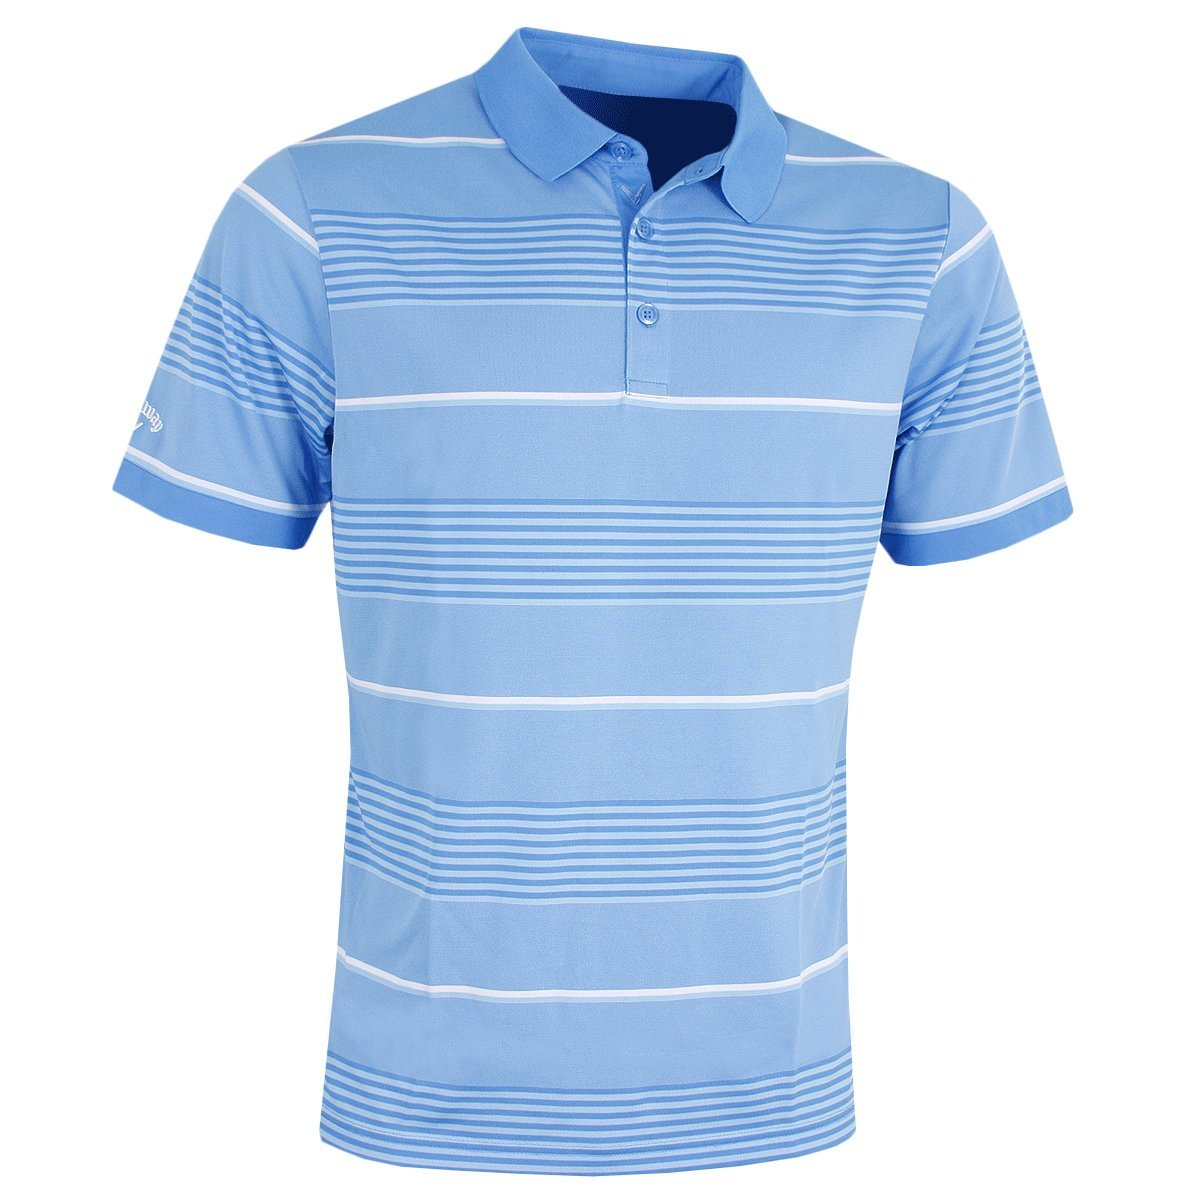 Callaway Golf 2018メンズopti-dri 3 Colour Stripe Golf Poloシャツ B078SX1JPD Large|ブルー ブルー Large